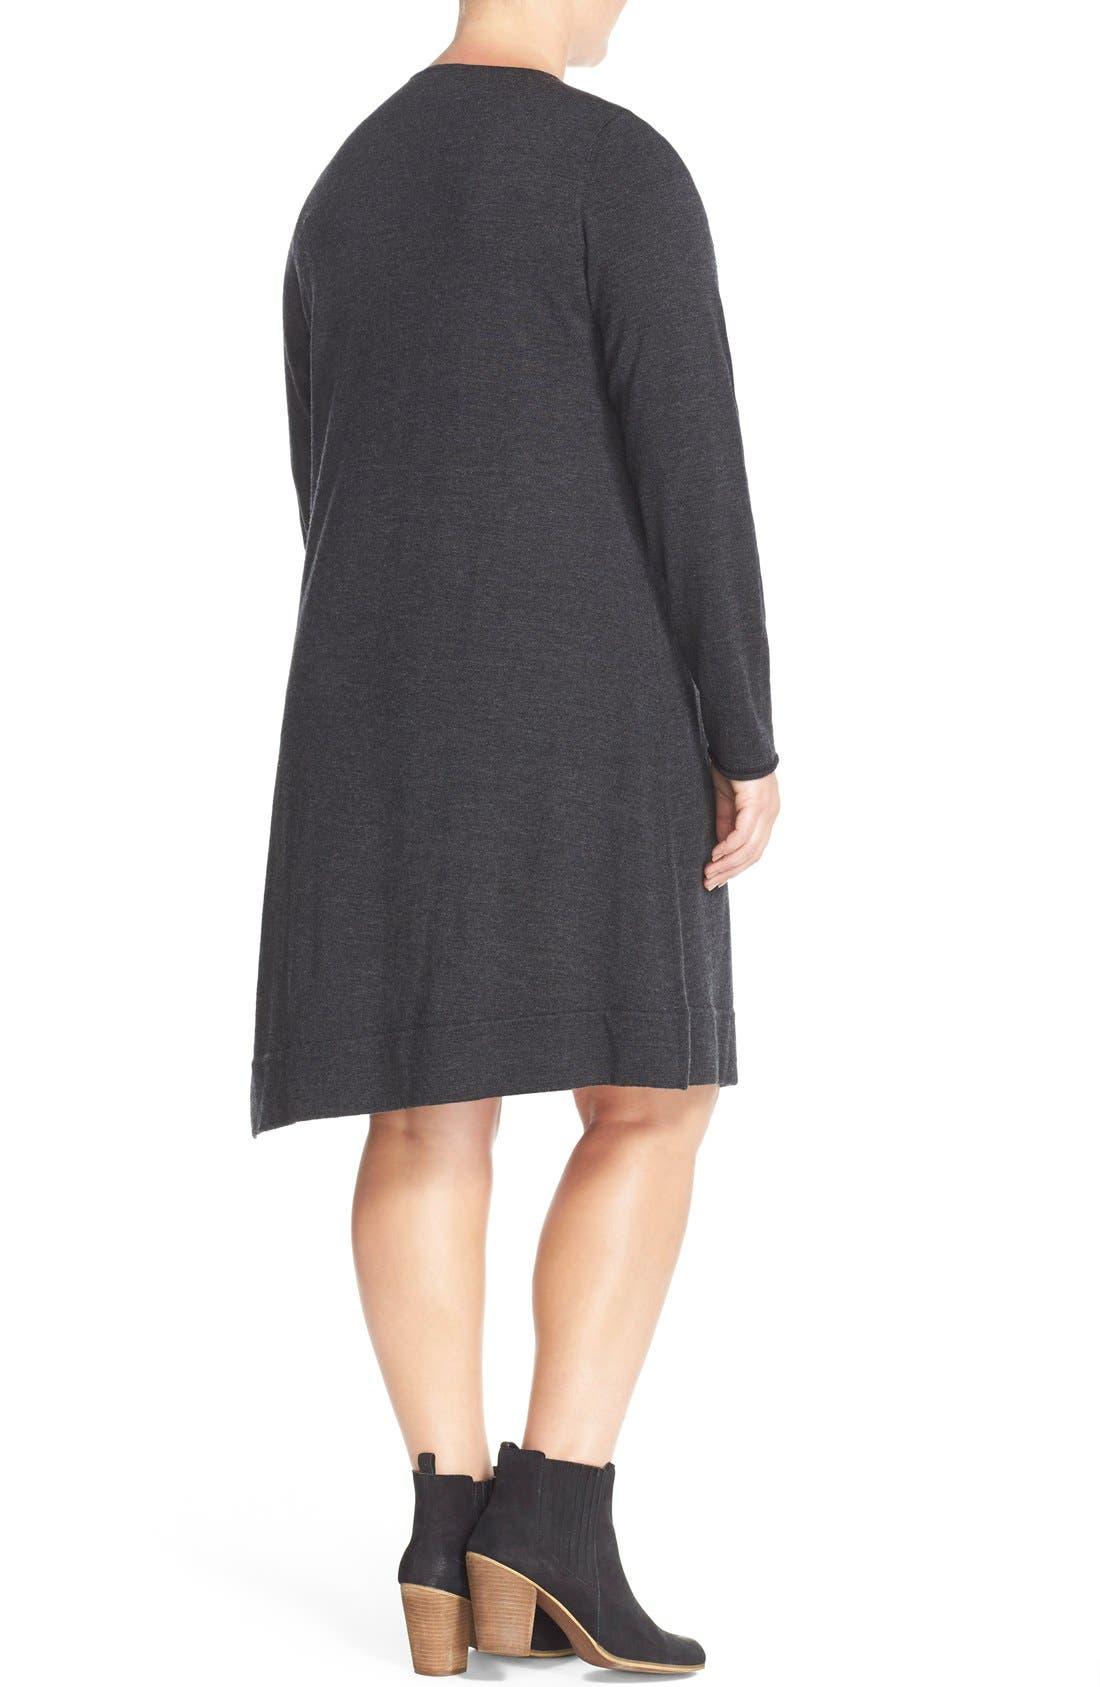 Alternate Image 2  - Eileen Fisher Merino Jersey Jewel Neck Dress (Plus Size)